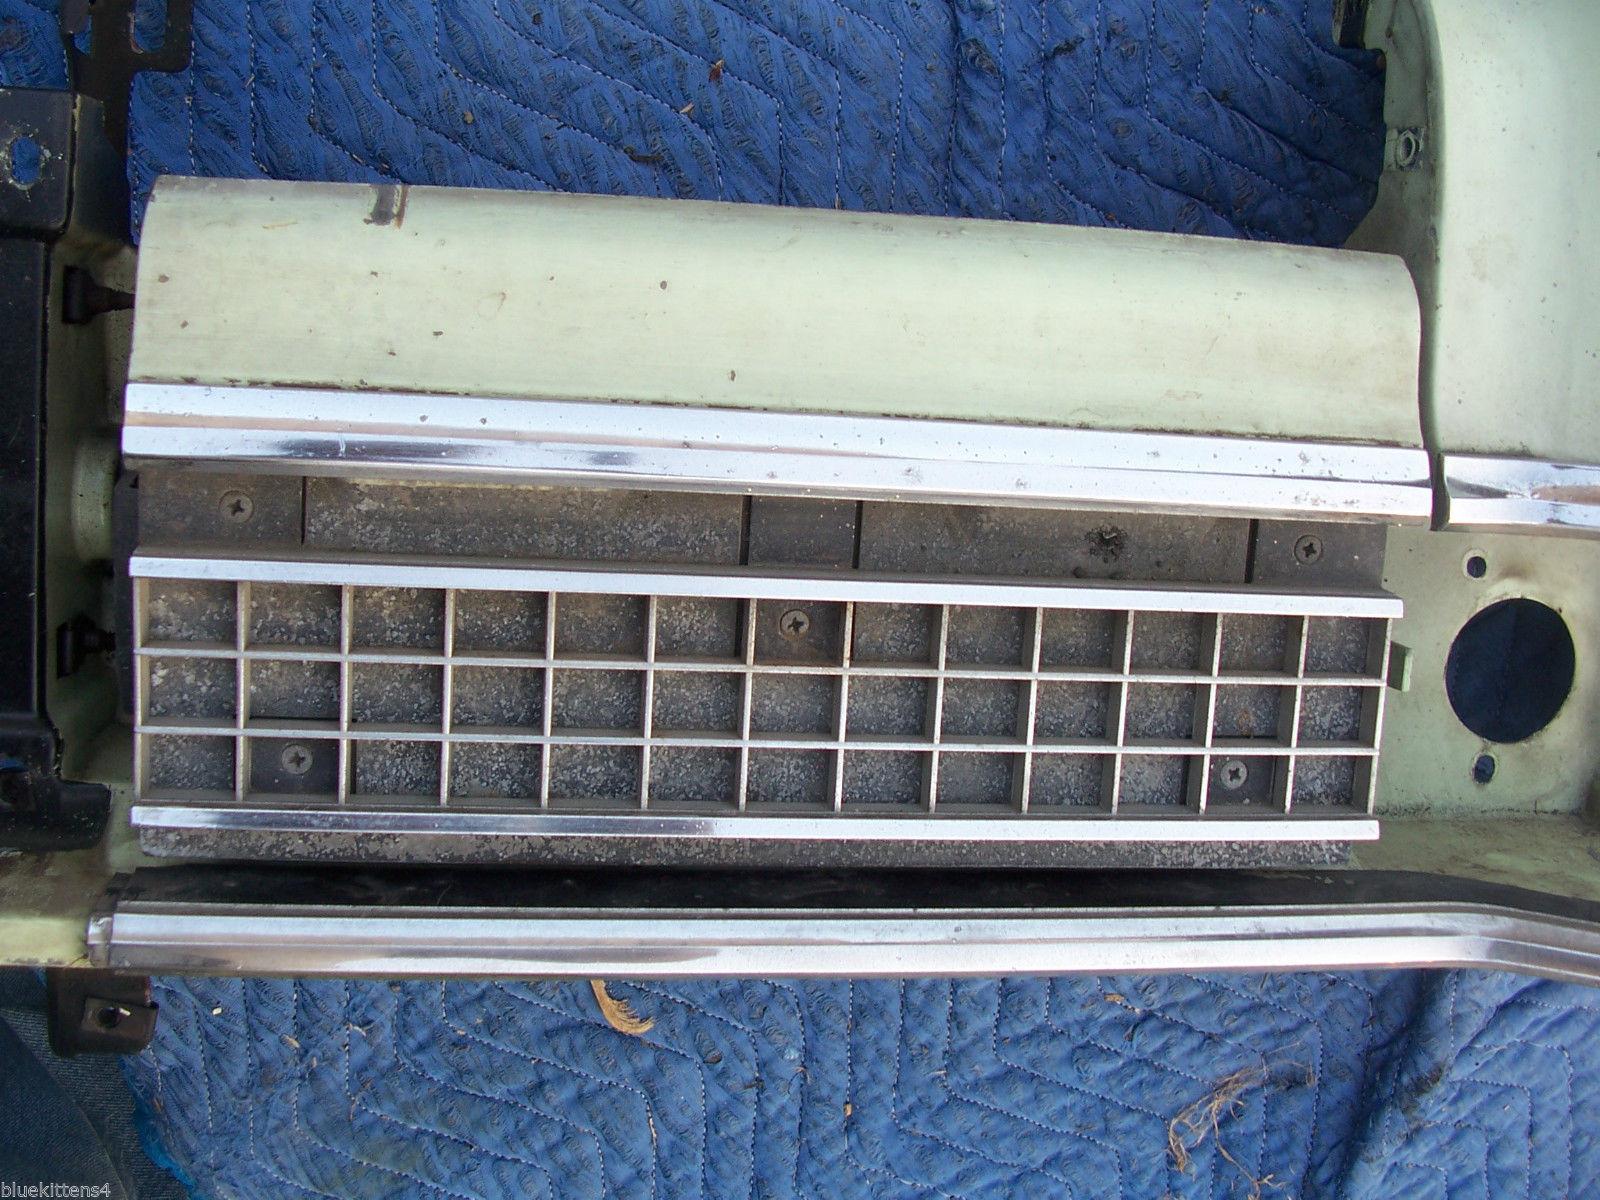 1973 MARQUIS LEFT HEADLIGHT BUCKET DOOR TRIM GRILL TRIM PANEL OEM USED MERCURY image 6